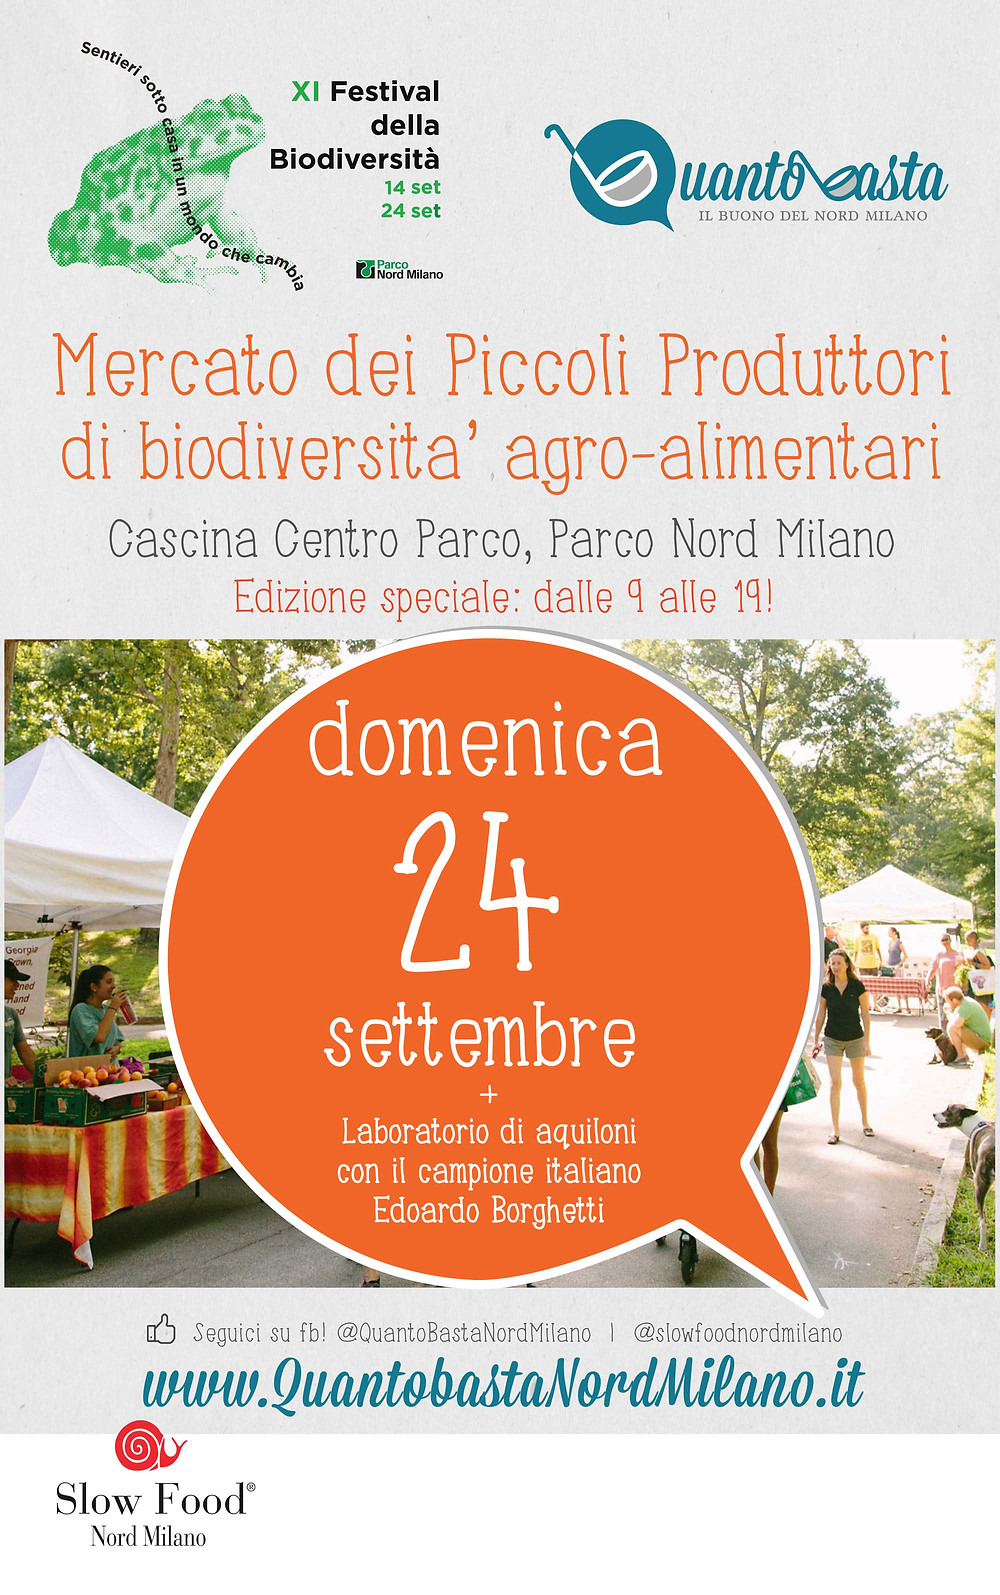 SLOW FOOD NORD MILANO FESTIVAL BIODIVERSITA